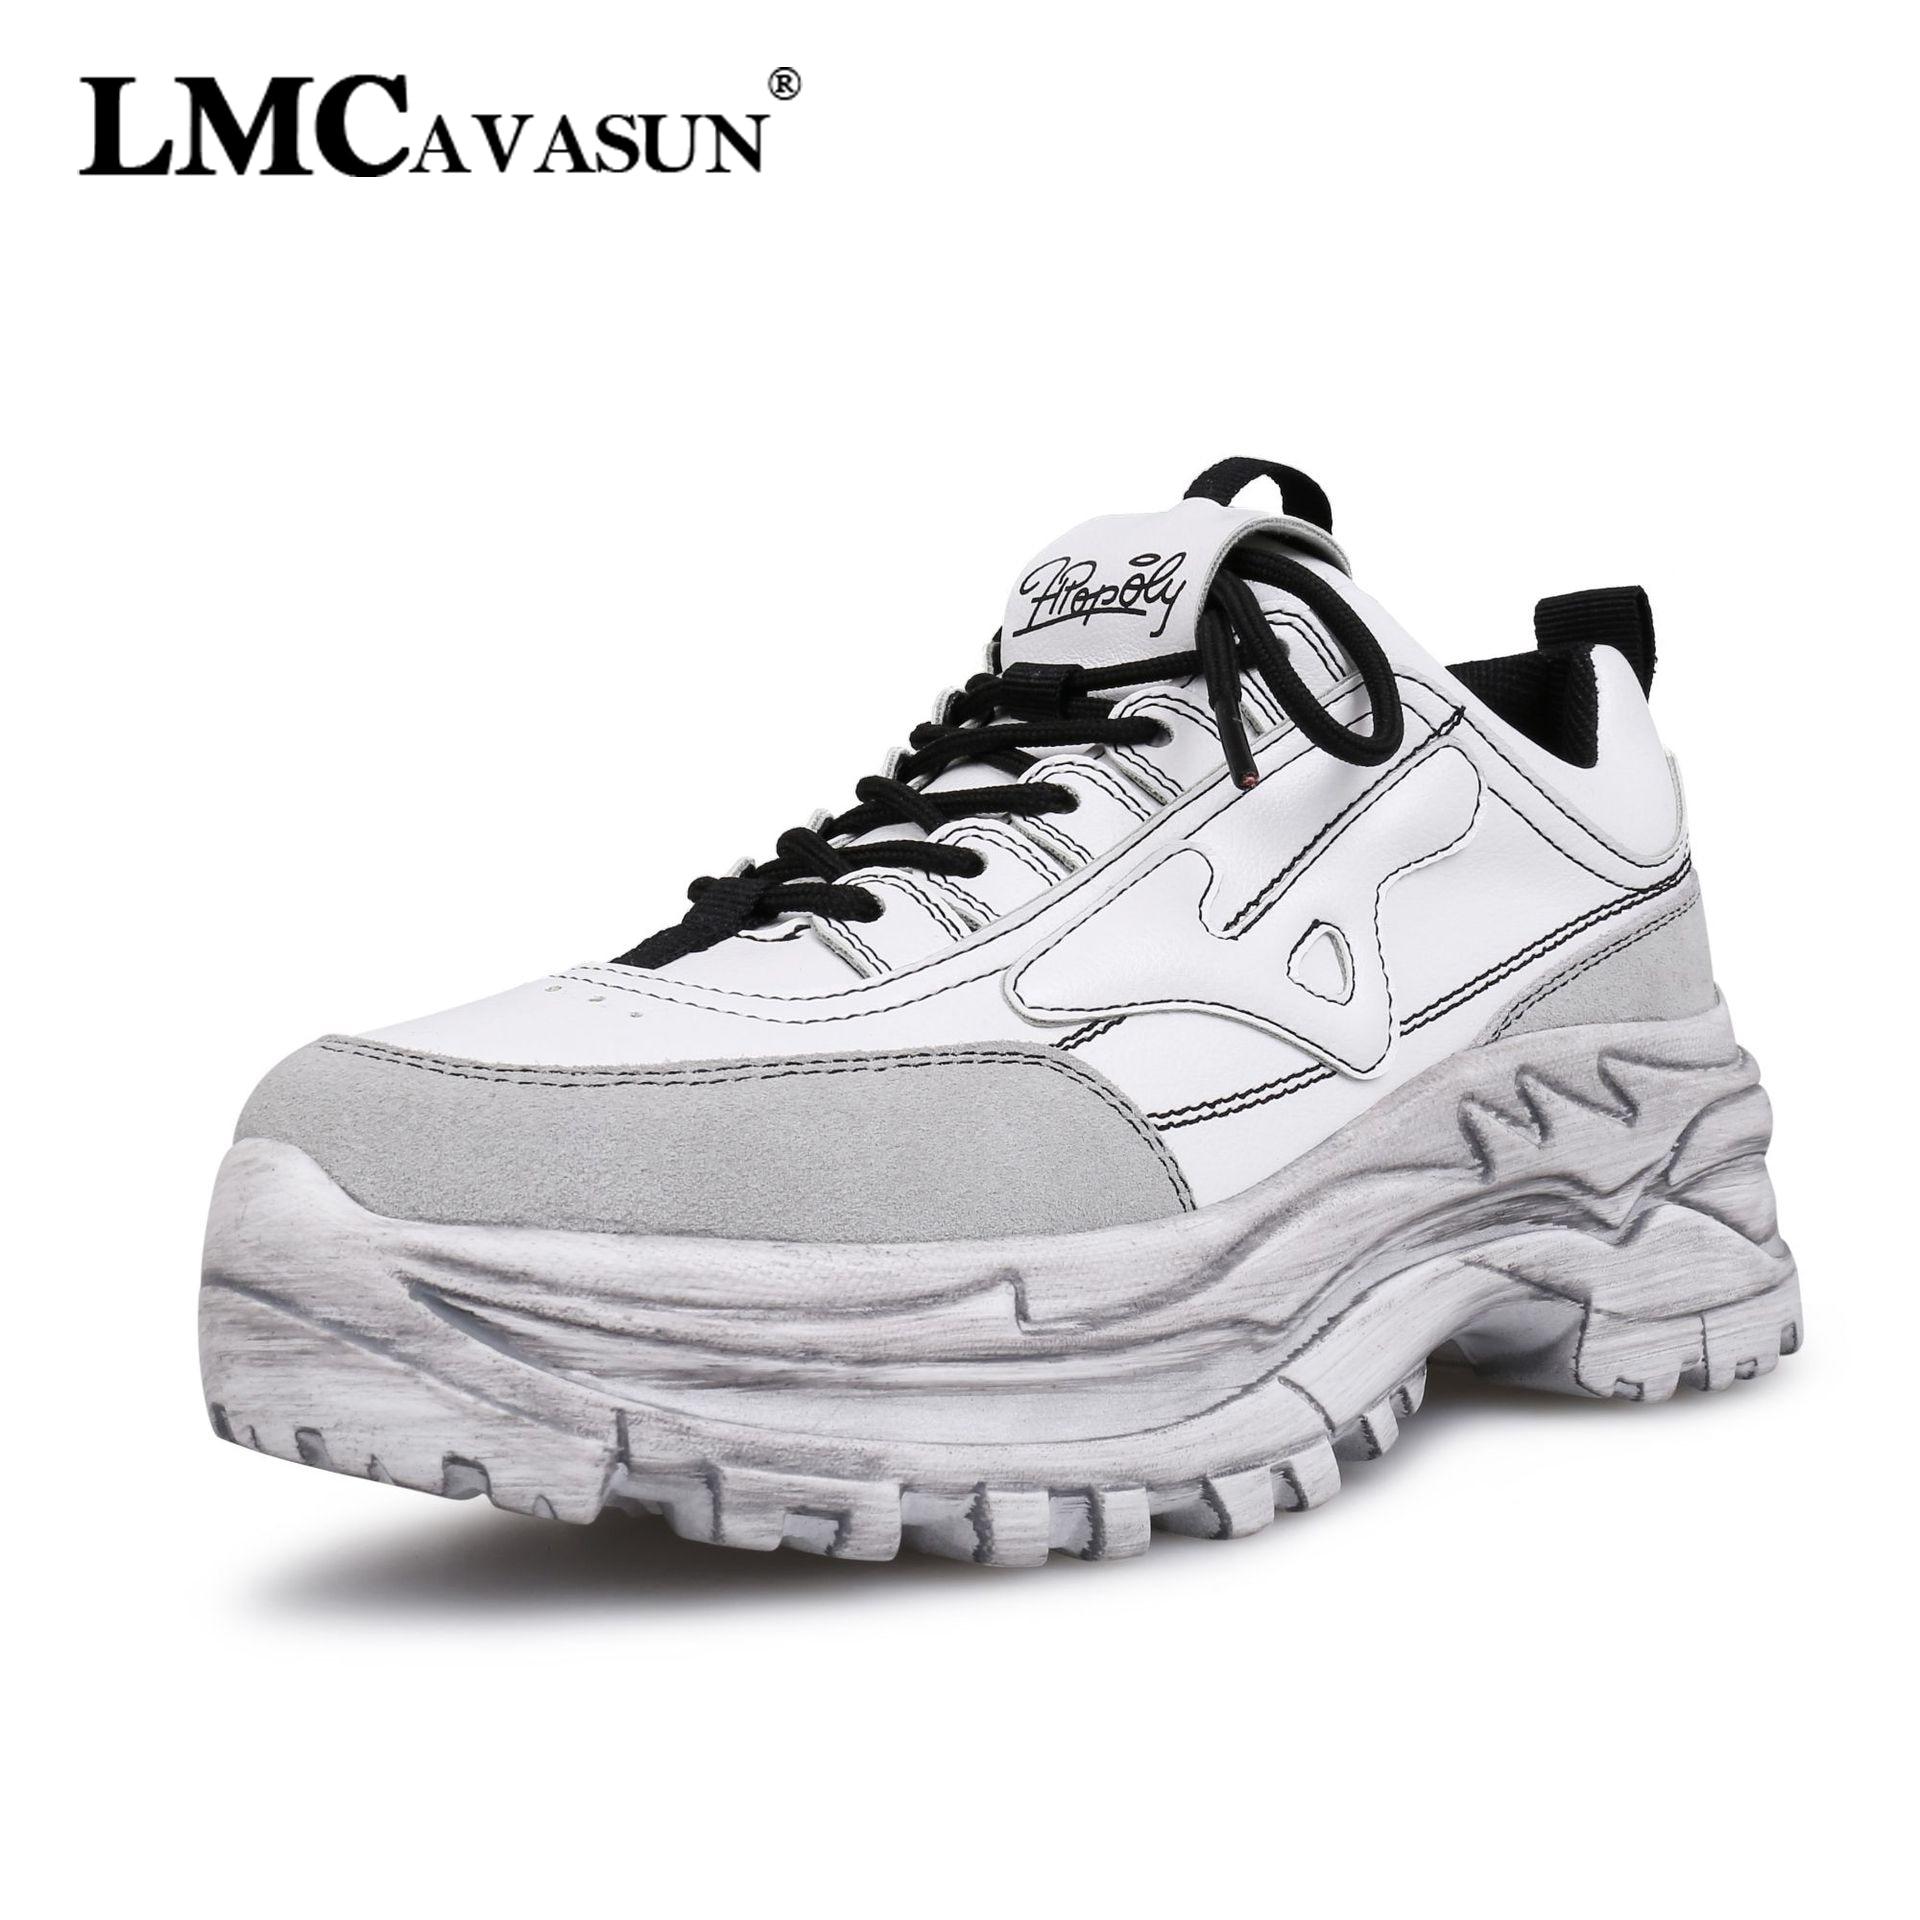 LMCAVASUN nouveau respirant Chunky plate-forme Sneakers femmes vache daim cuir chaussures Femme baskets à la mode Femme chaussures Basket Femme